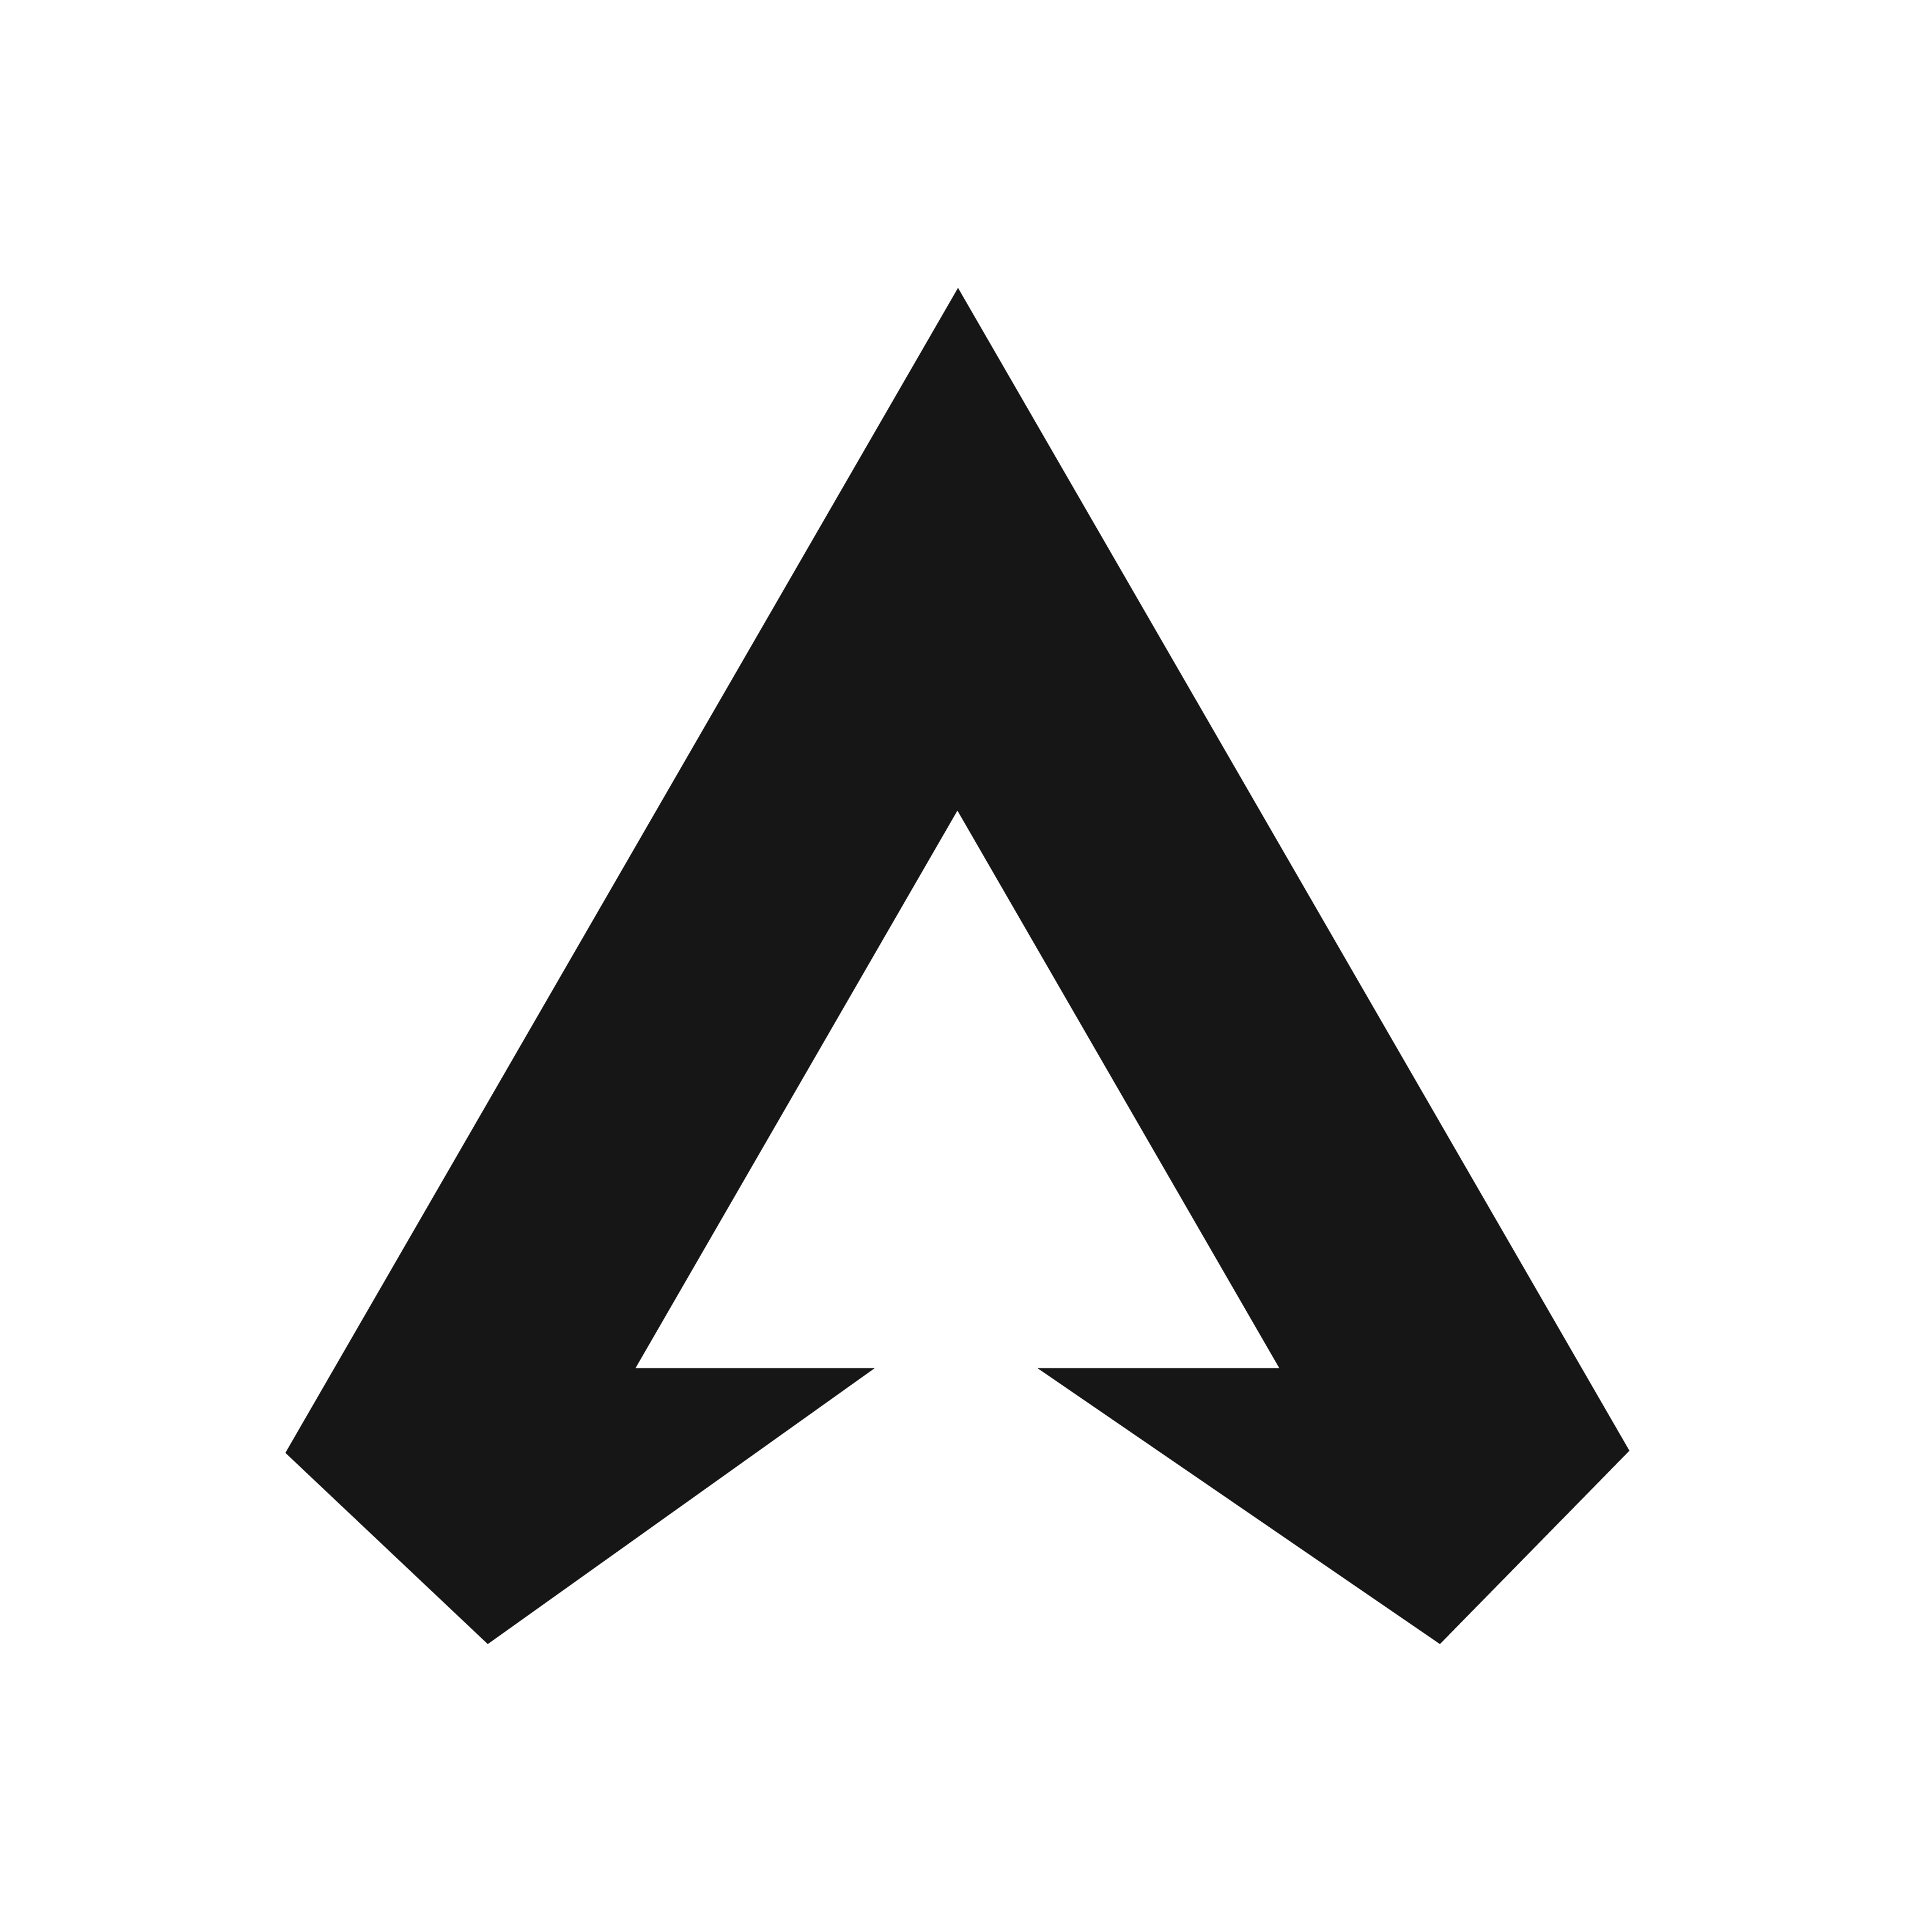 Apex Legends Icon High Resolution Png Image Initials Logo Design Logo Design Monogram Logo Design